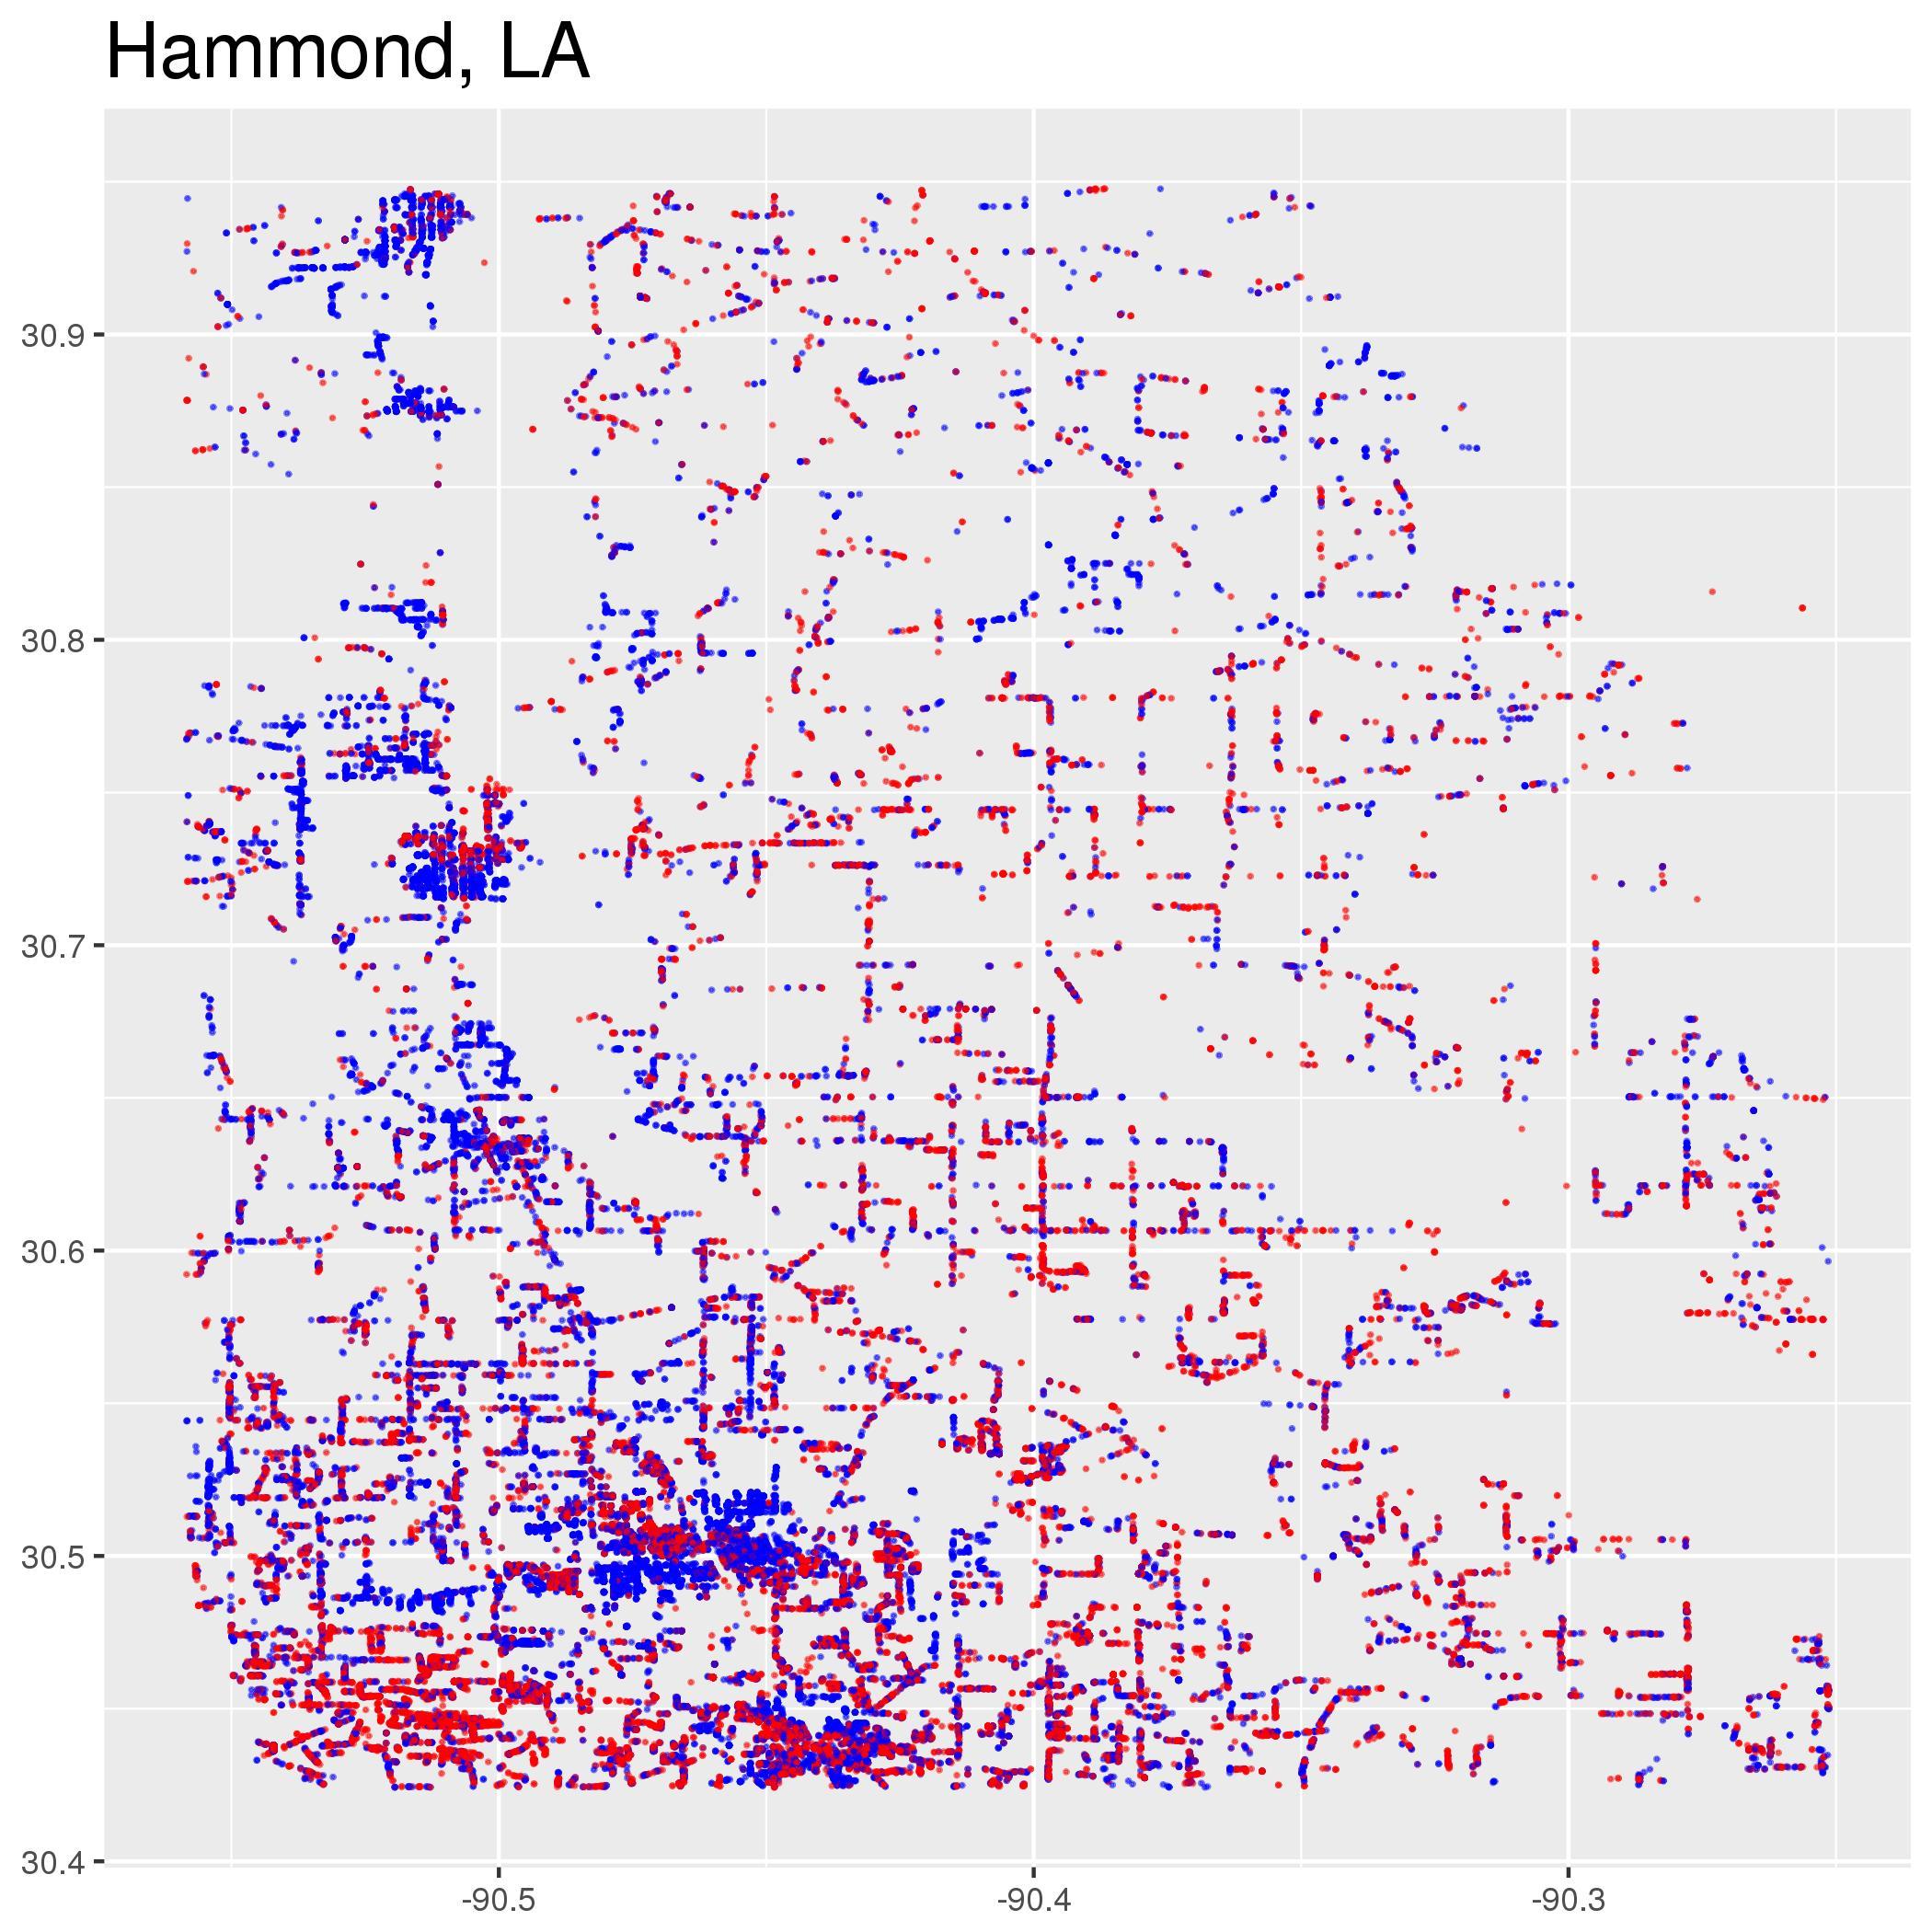 HammondLA.jpeg